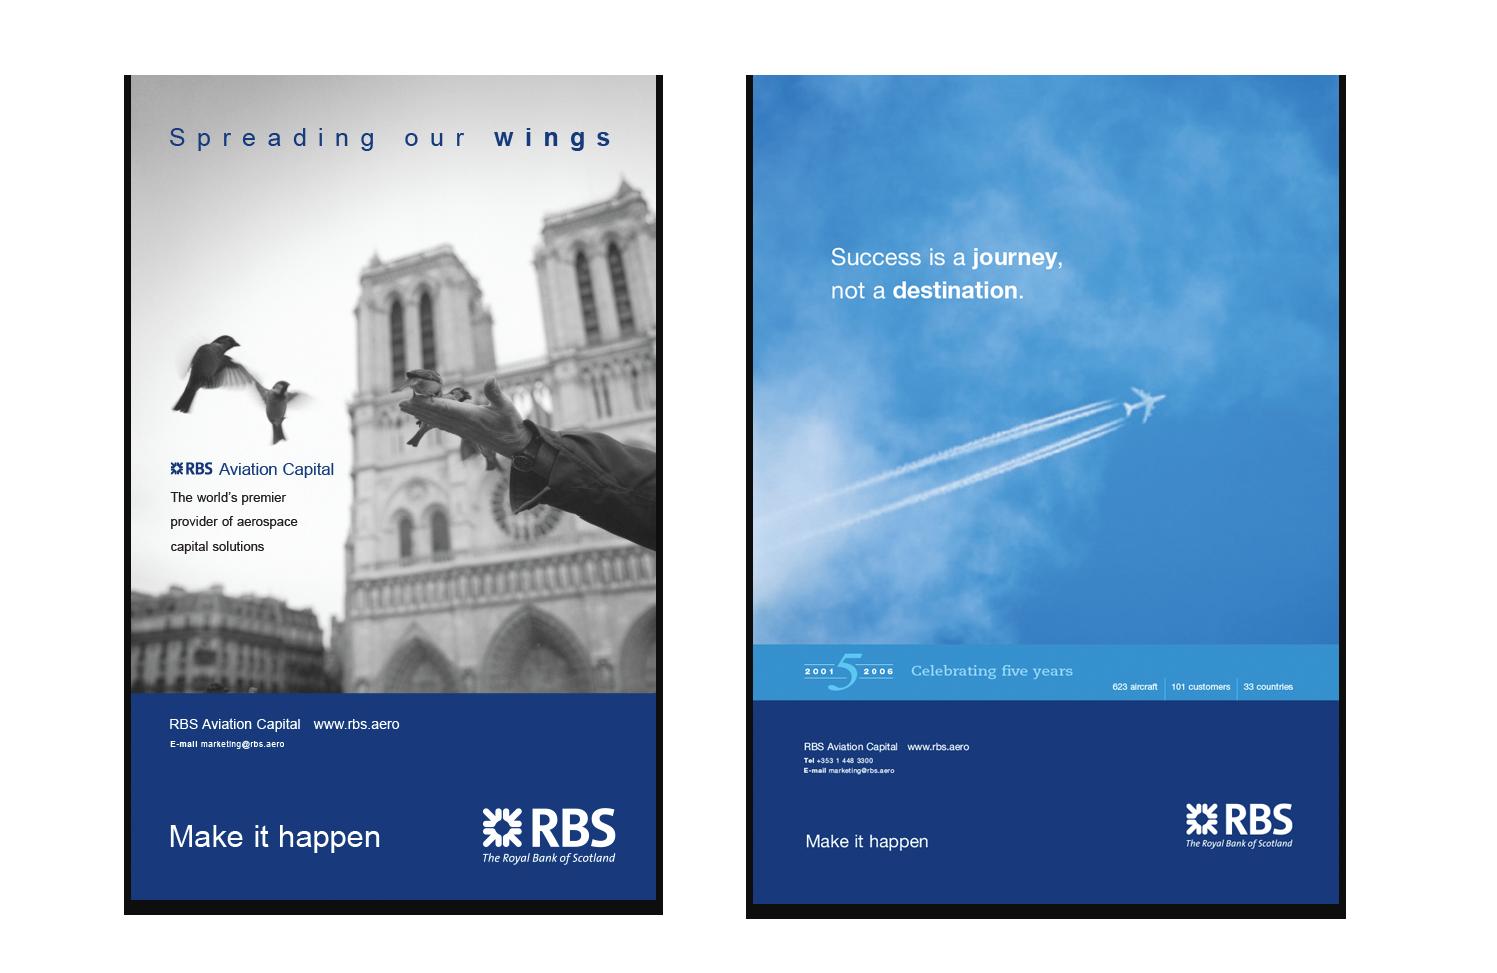 b_rbs_aviation_ads_travel_design